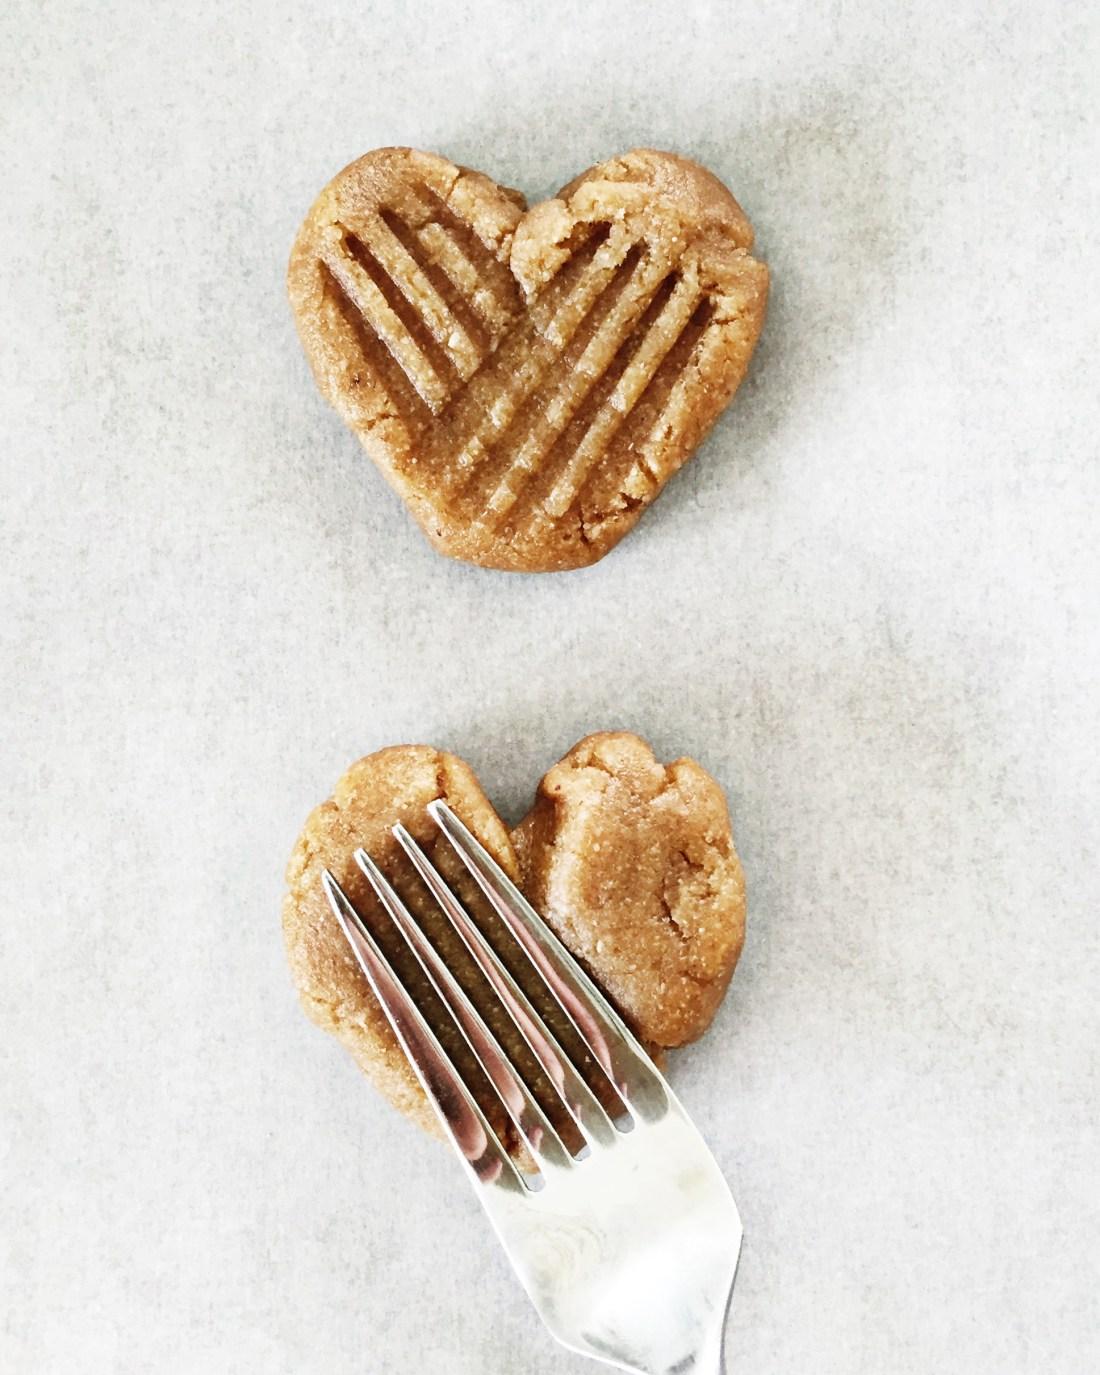 Heart Shaped Peanut Butter Cookies